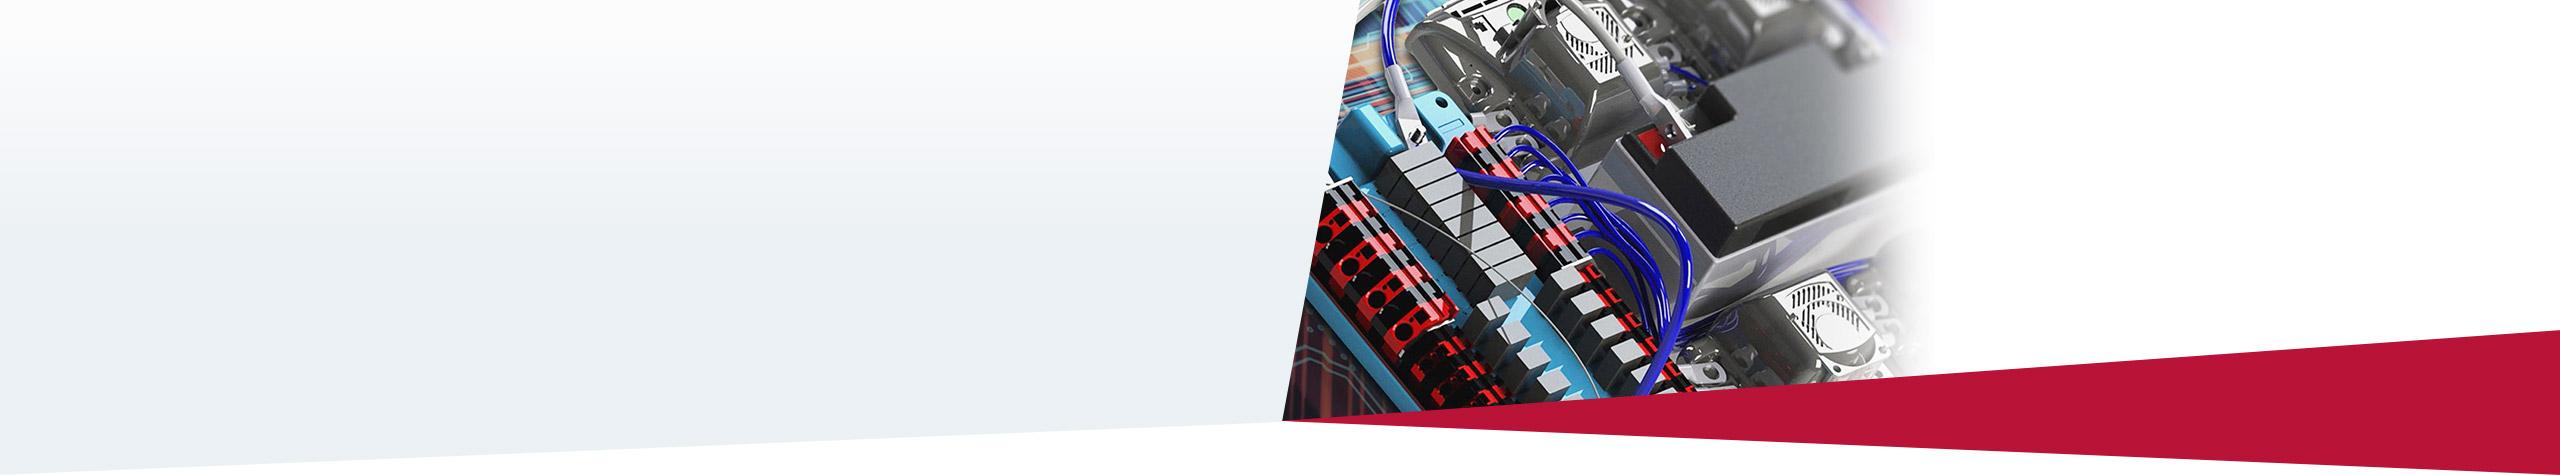 SOLIDWORKS Electrical ECAD-MCAD nahtlos integriert.